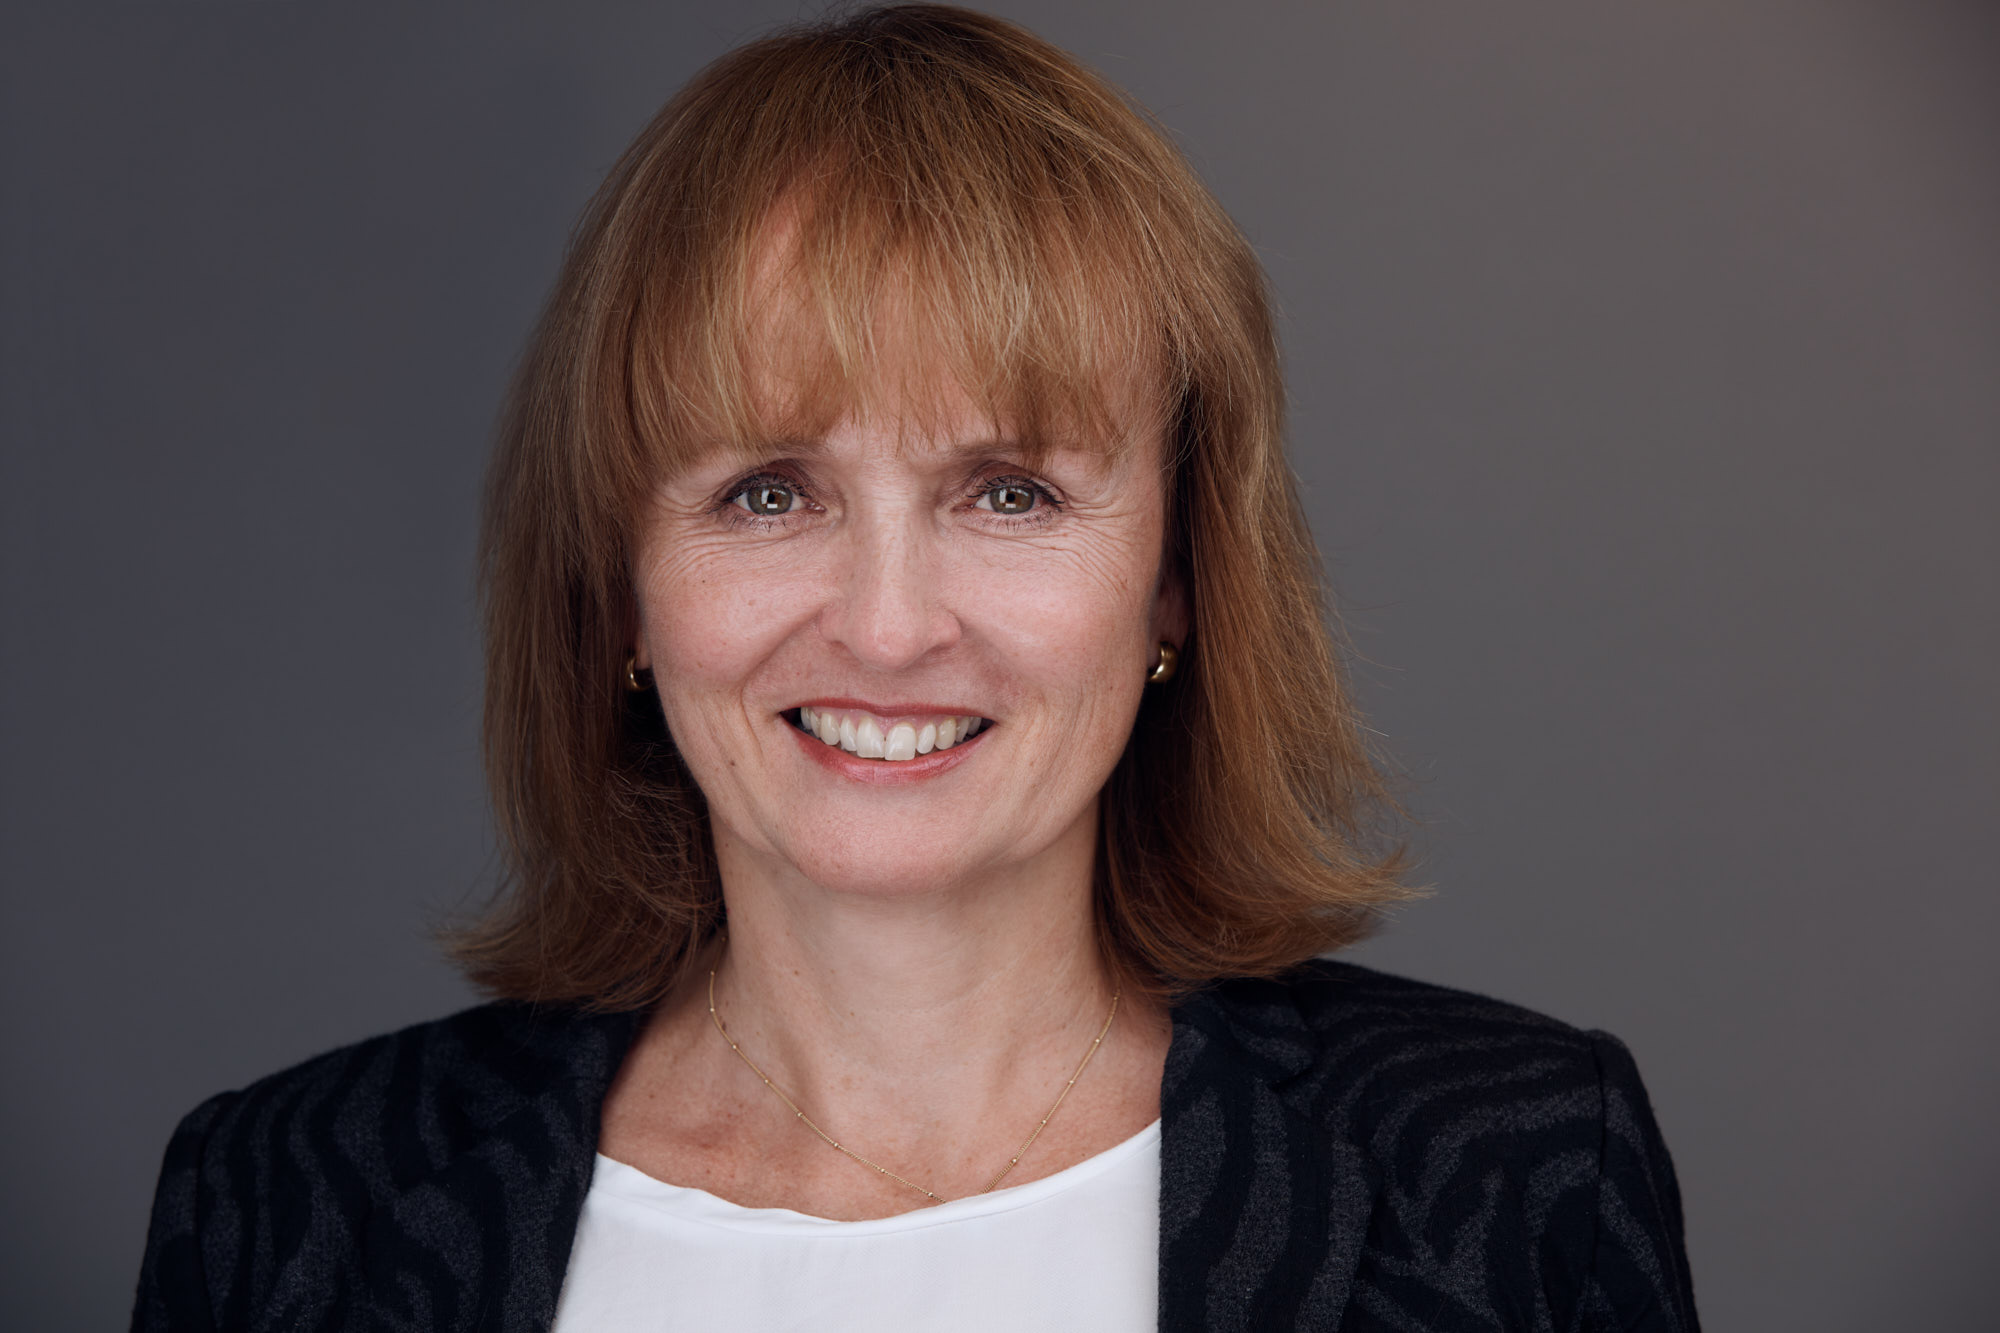 Picture of Annemieke van der Heijde